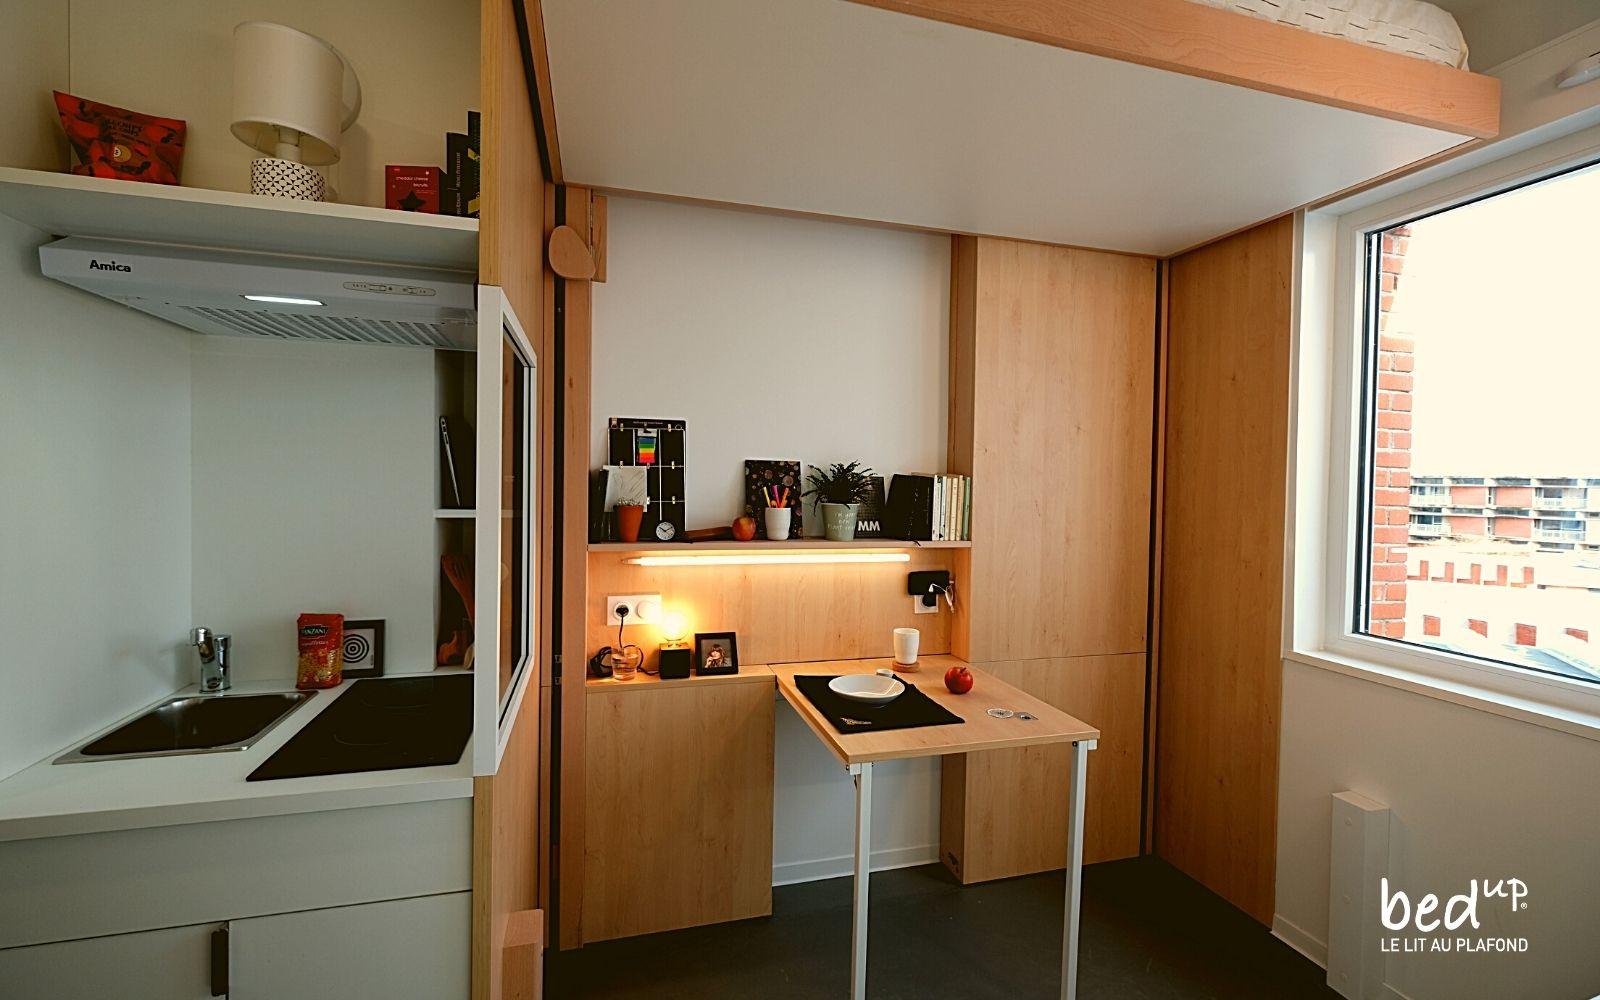 lit escamotable residence bedUp®Campus